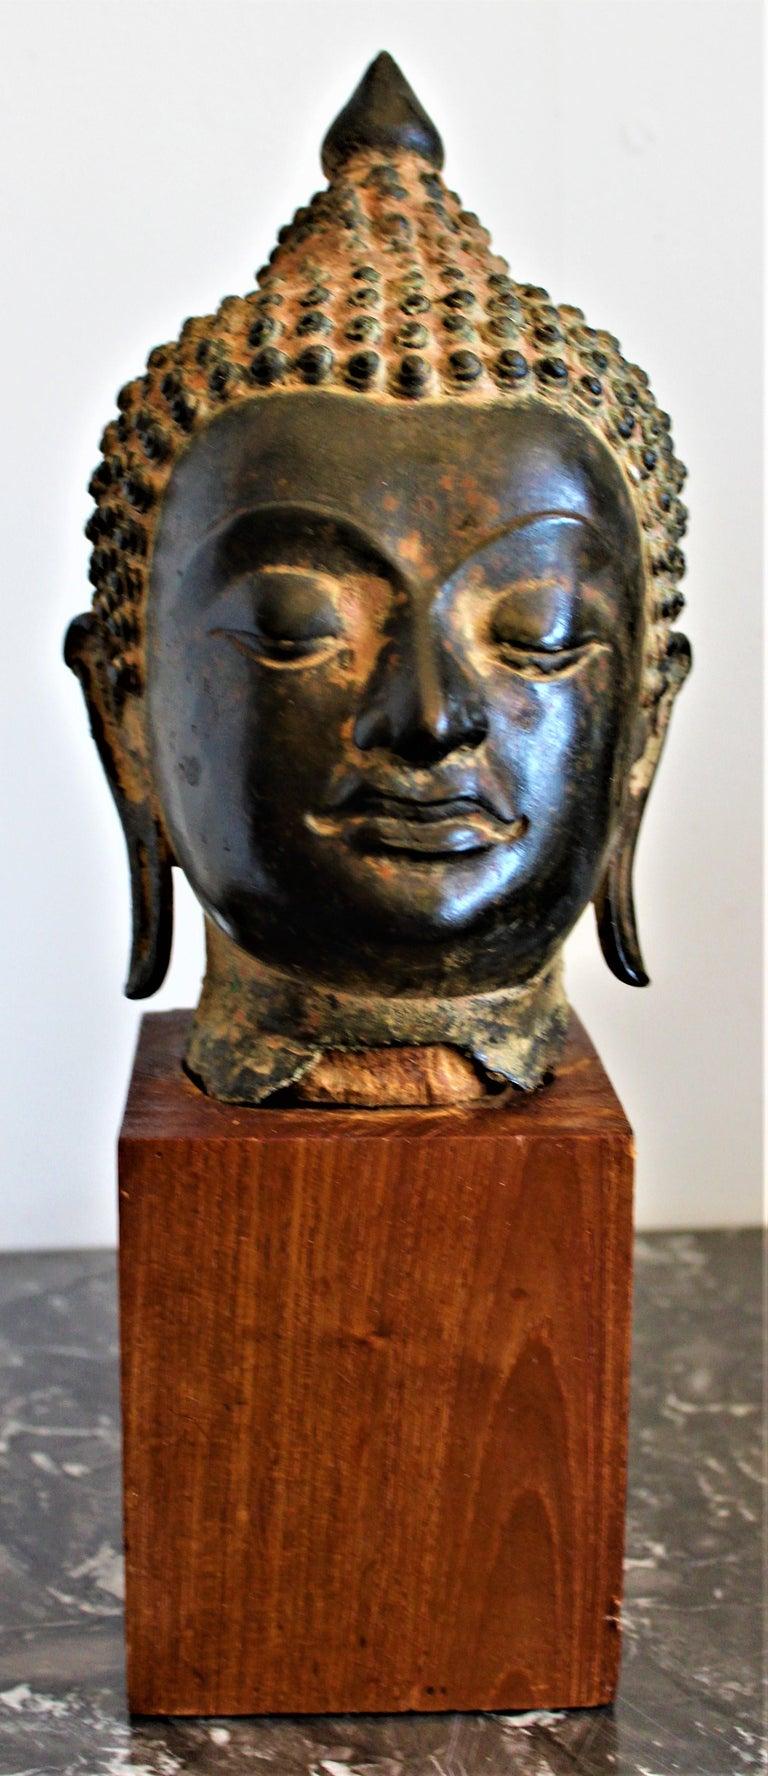 Antique Asian Cast Bronze Buddha Head Fragment Bust Sculpture Thai, 18th Century For Sale 6